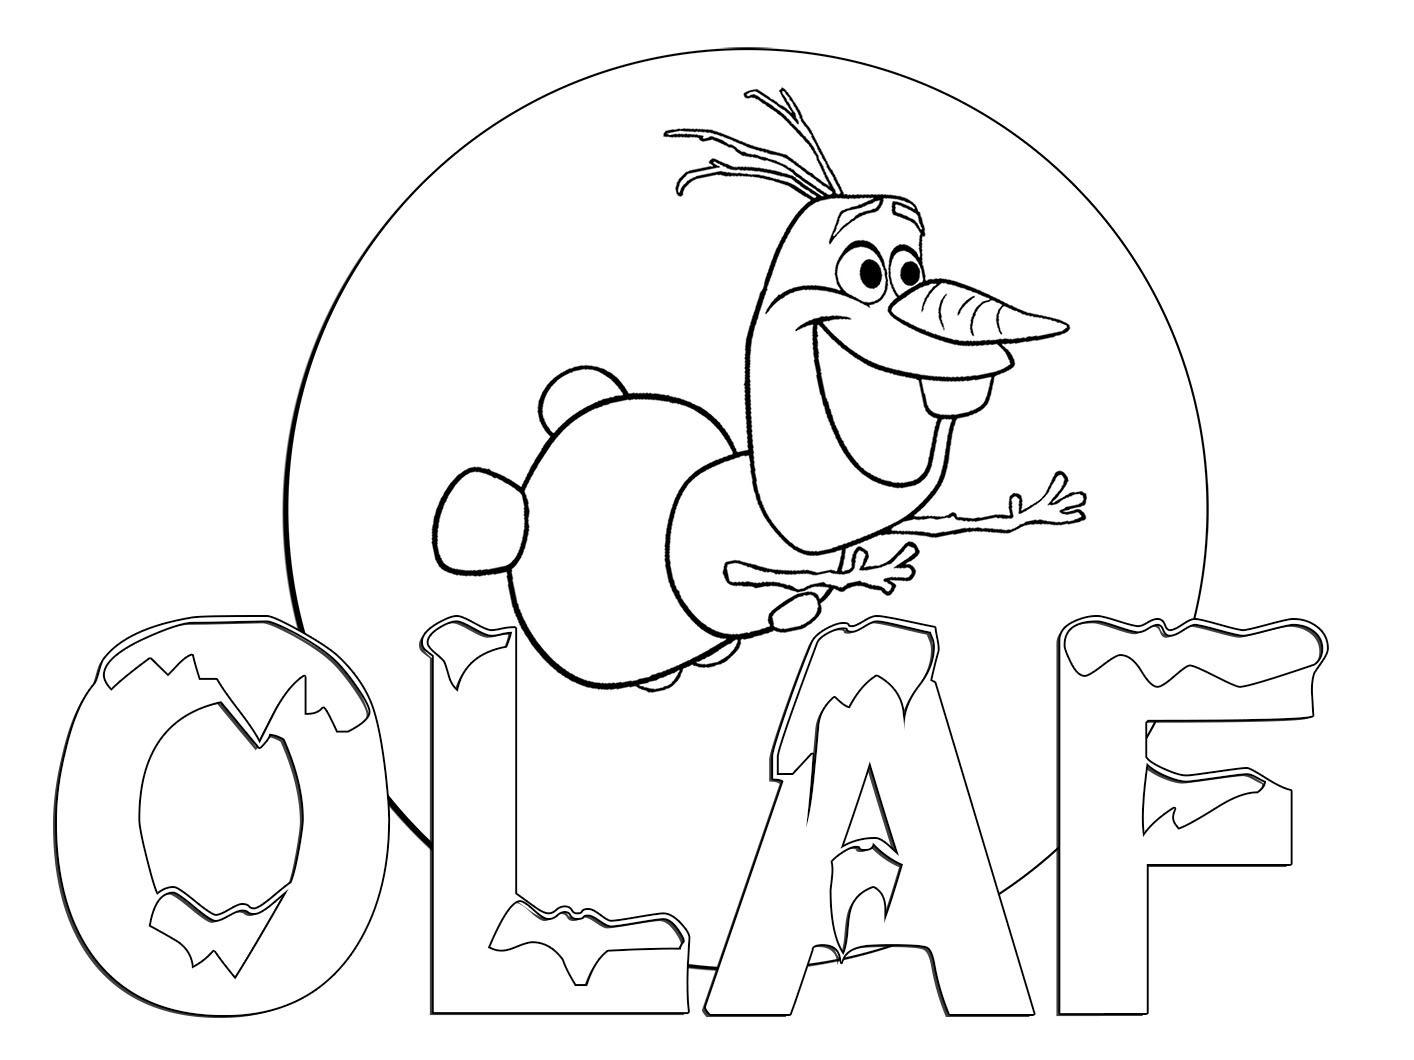 1414x1060 Printable Coloring Pages For Kids Disney Frozen Printable Menu